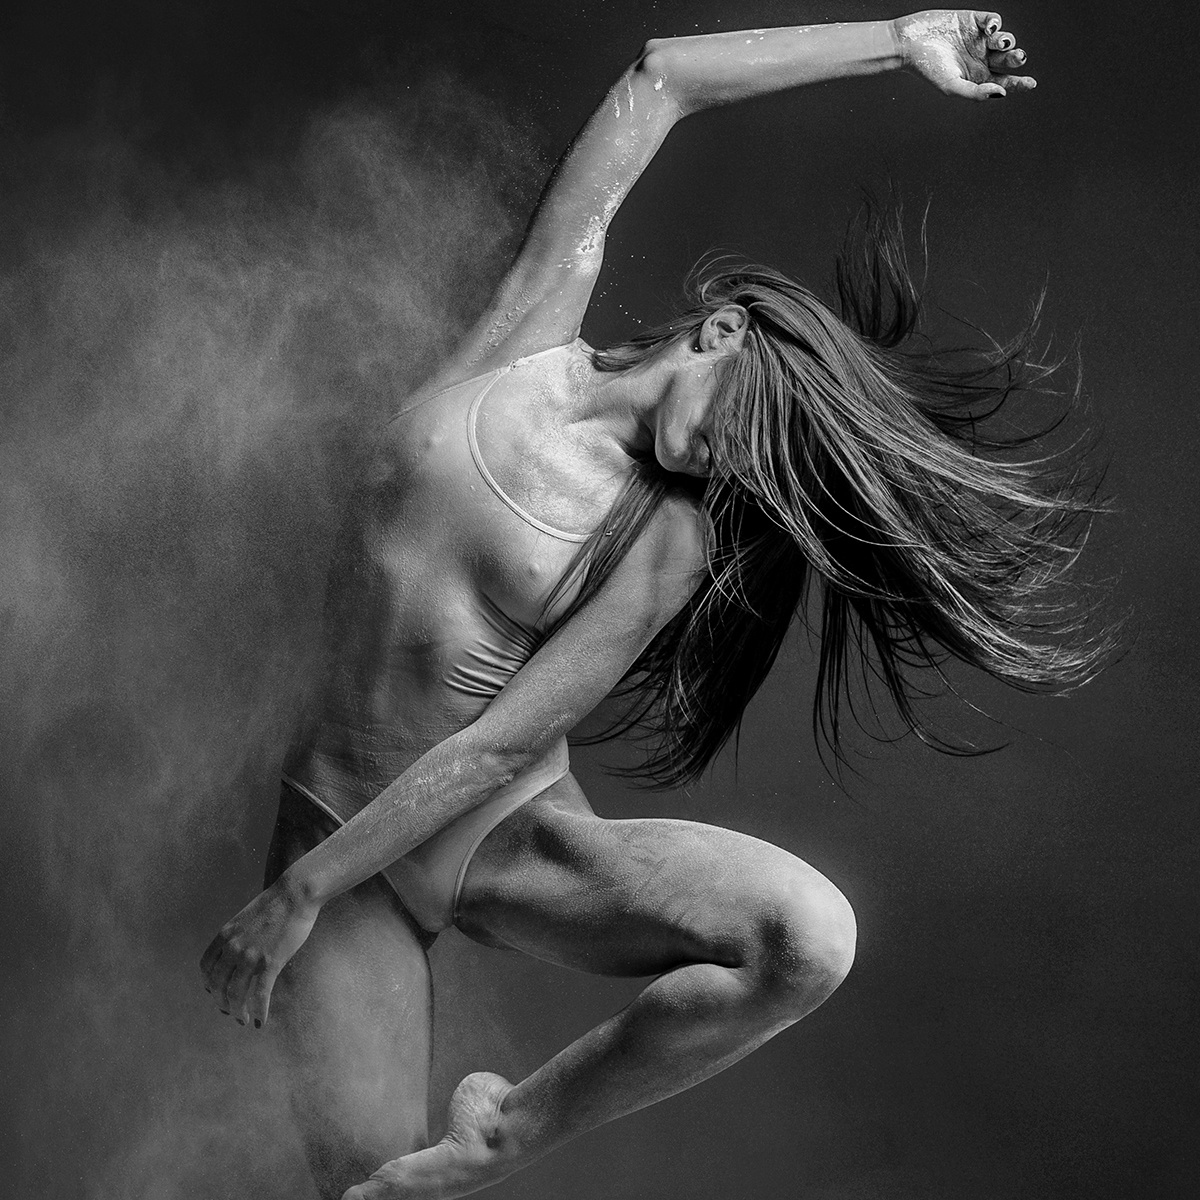 Surface photography by yevgeniy repiashenko